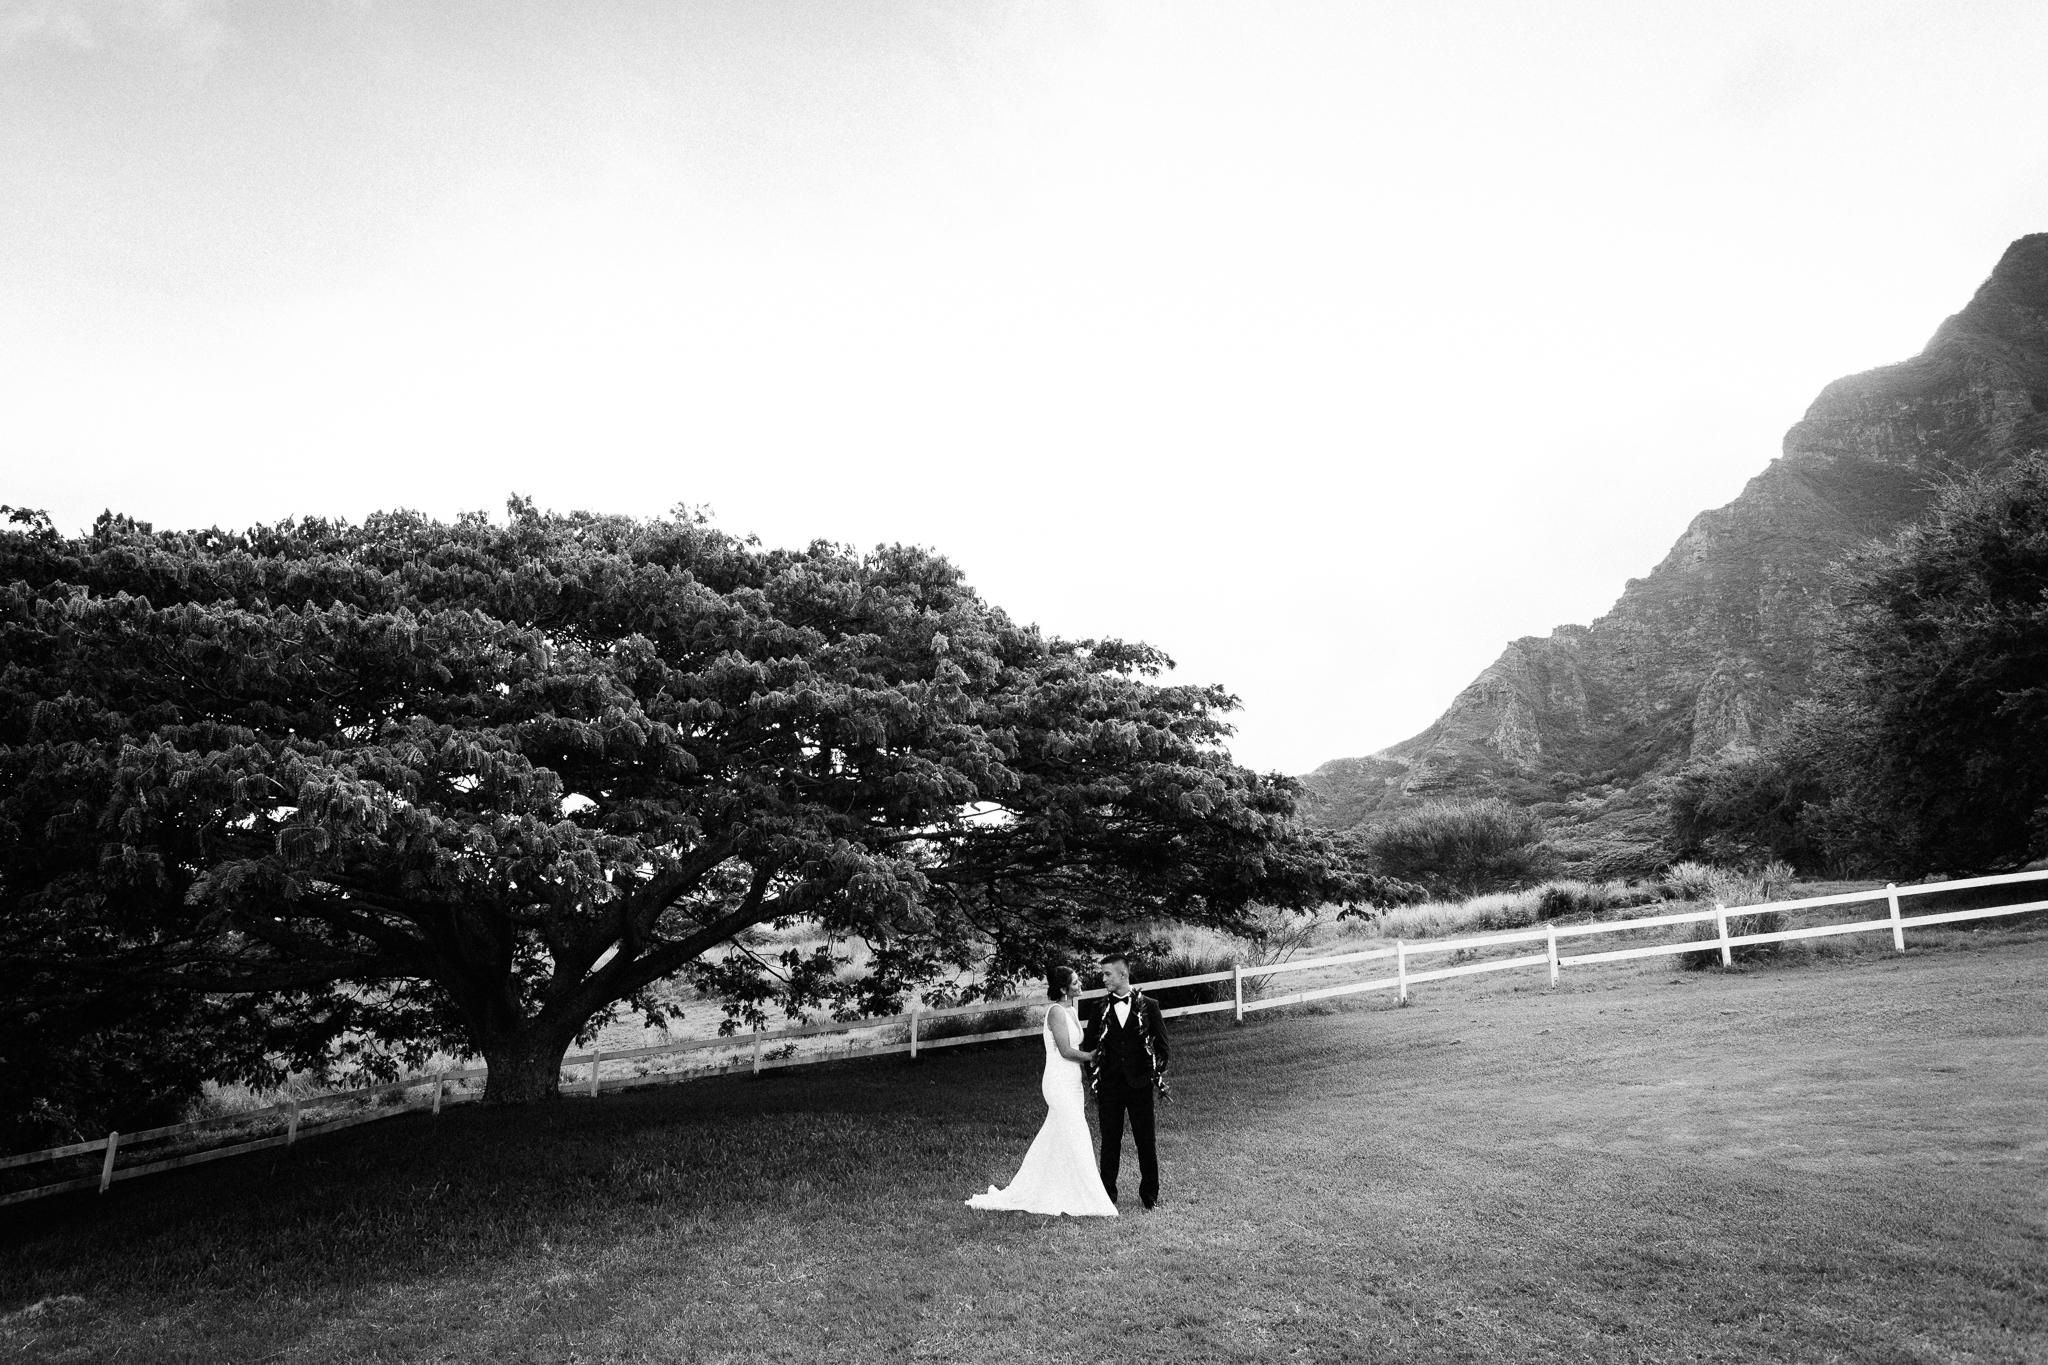 Kualoa_Ranch_Wedding_Photographer_Tone_Hawaii-28.jpg